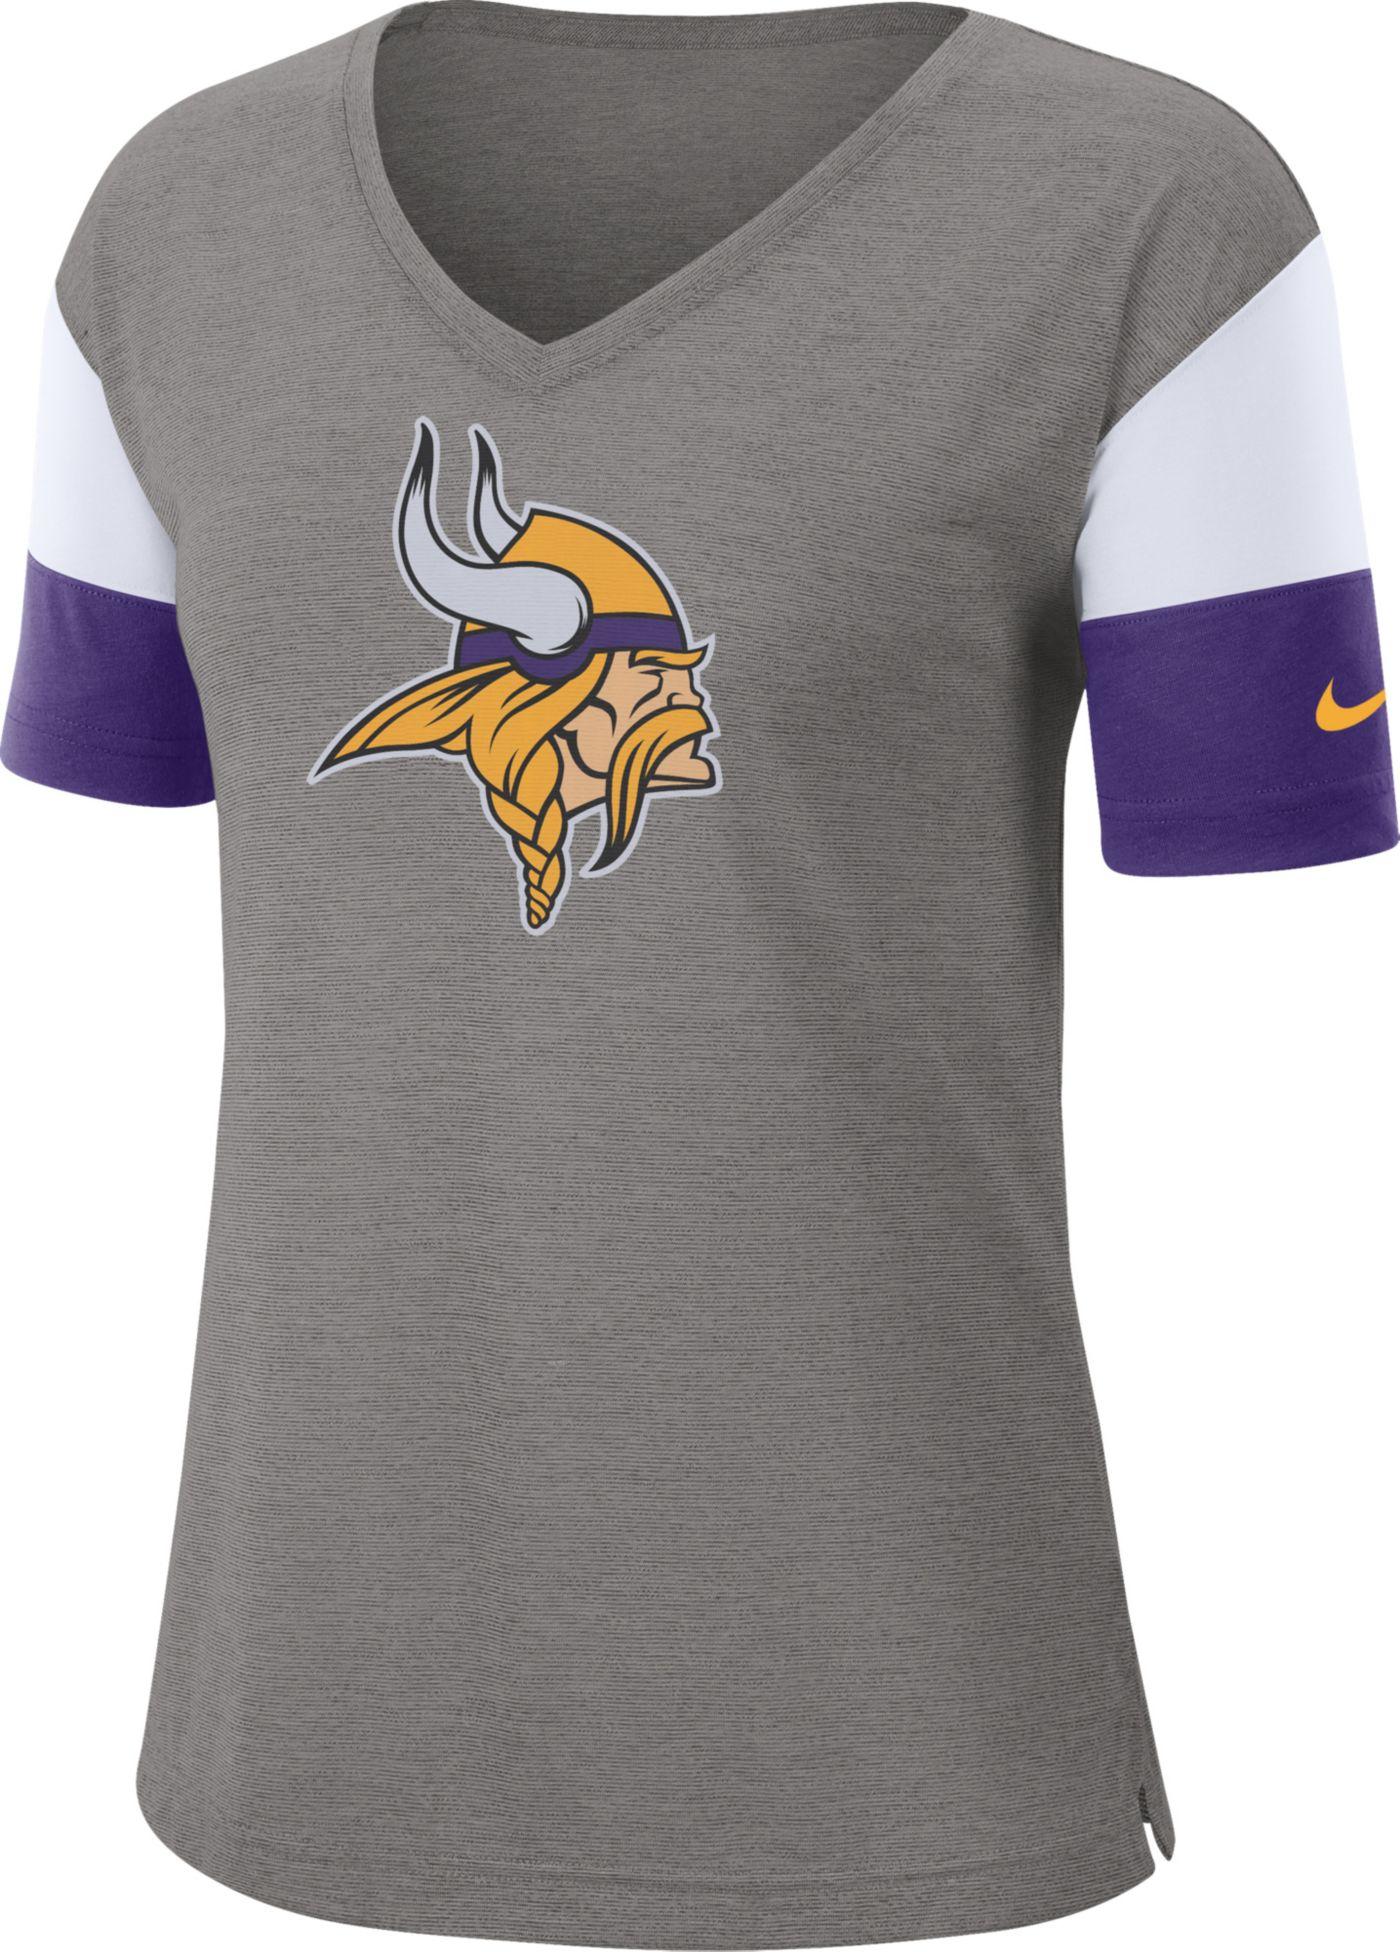 Nike Women's Minnesota Vikings Breathe Heather Grey V-Neck T-Shirt